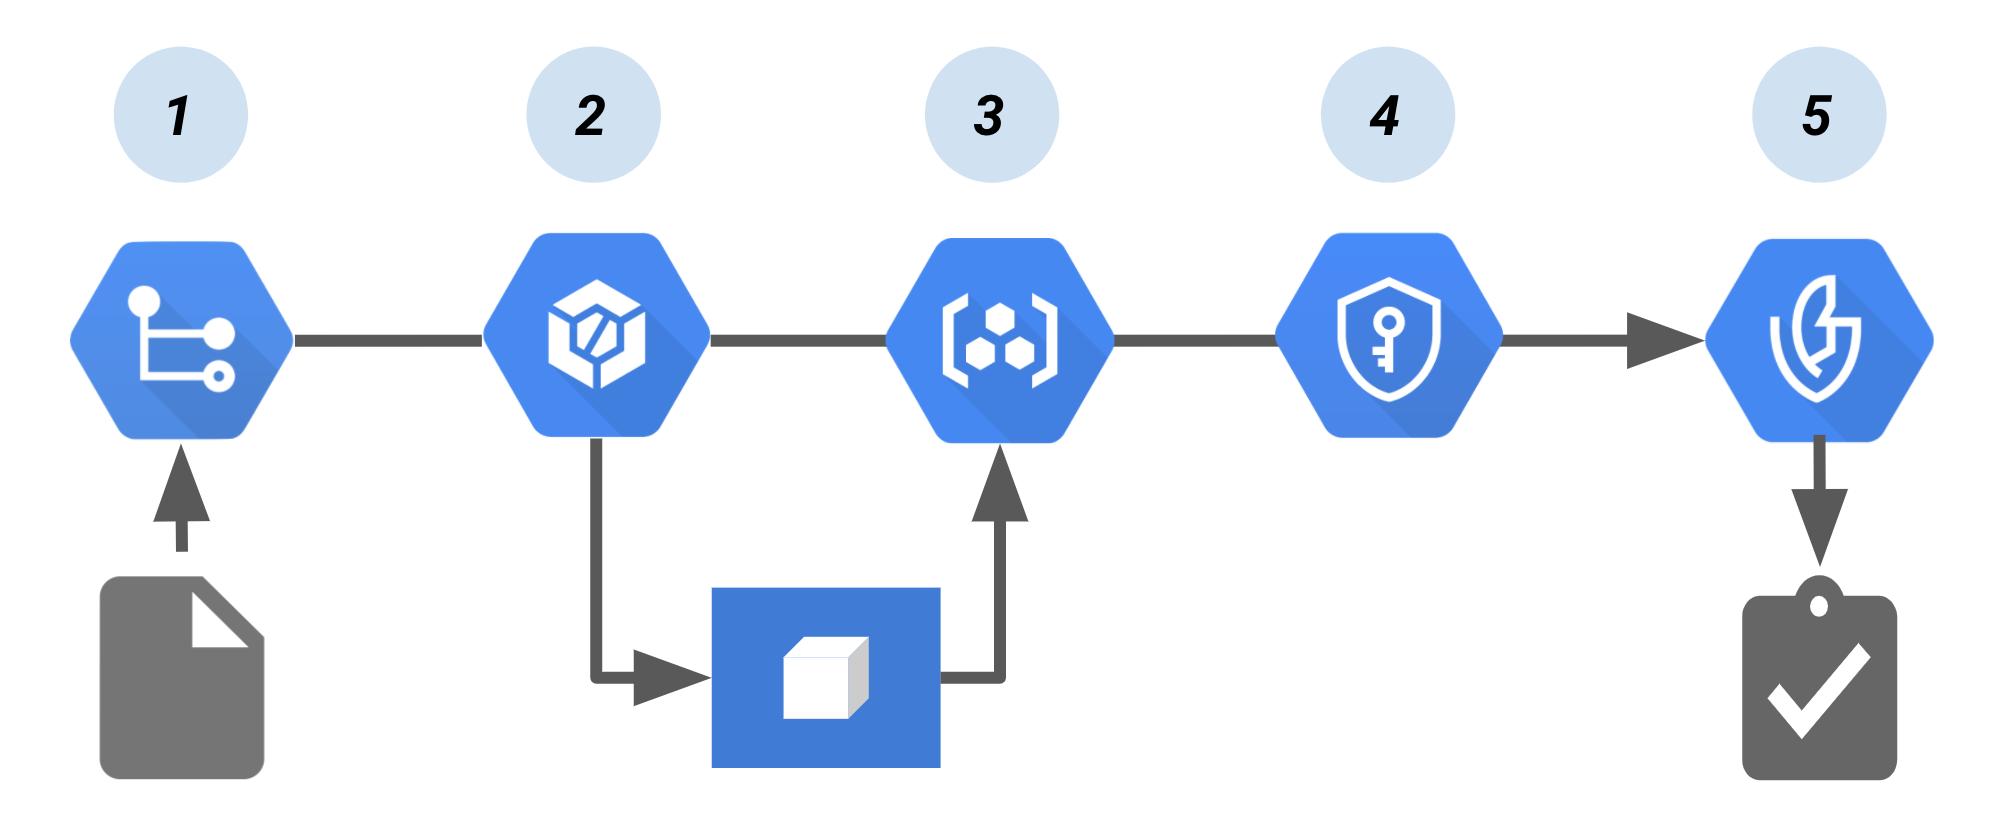 Cloud Build と Binary Authorization による認証パイプライン。